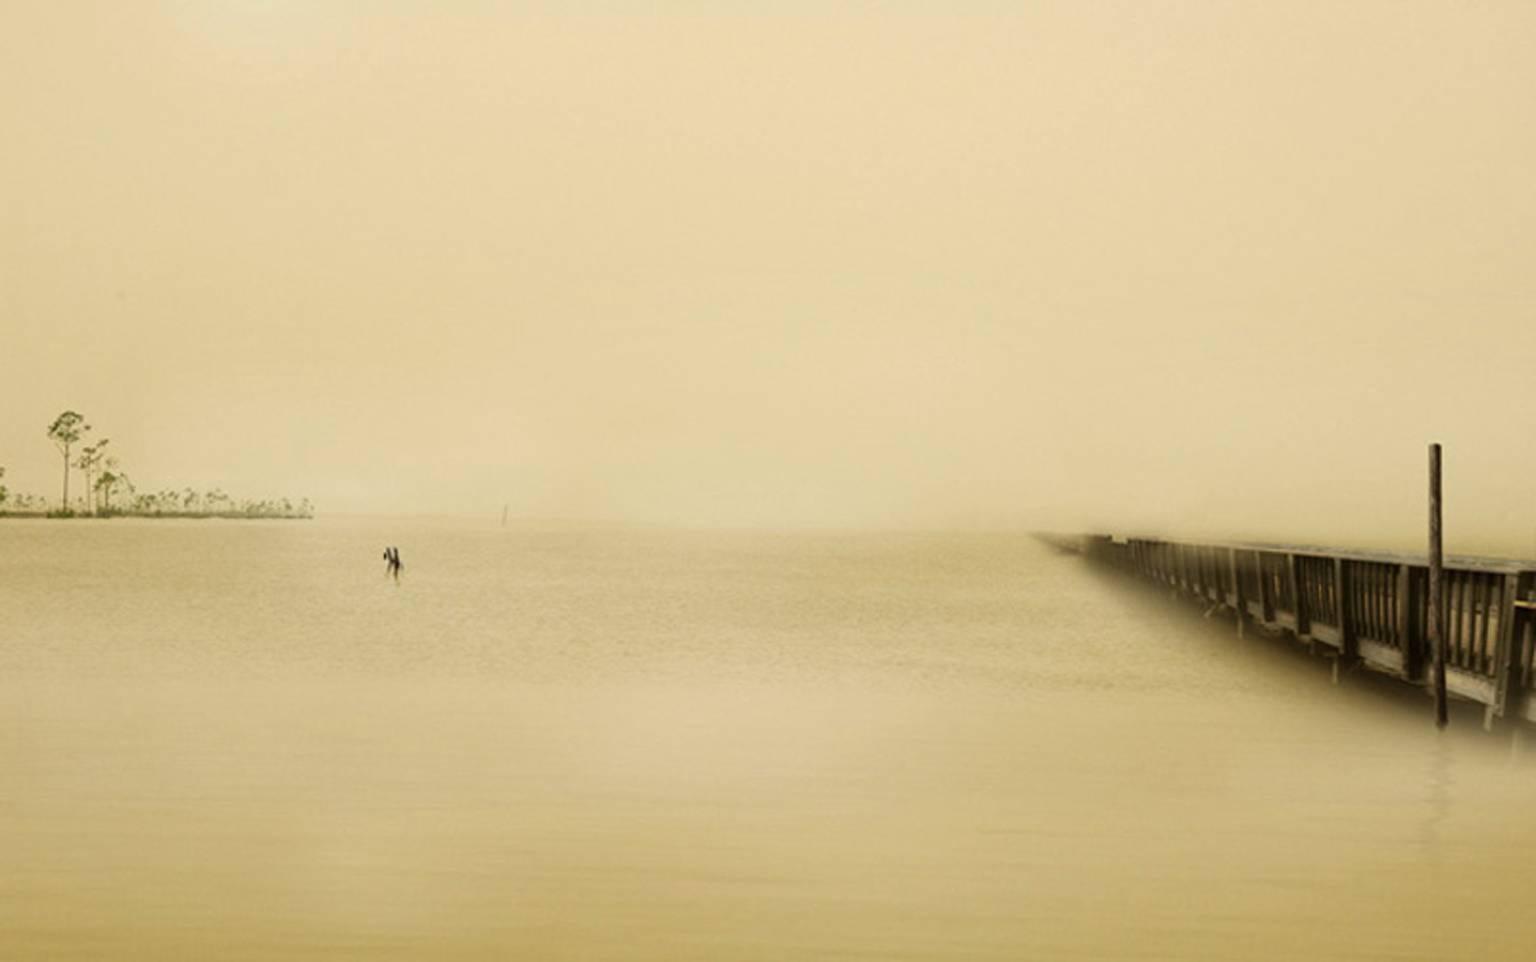 Horizon Fields LV (Minimalist Landscape photo of Island and Wooden Dock)